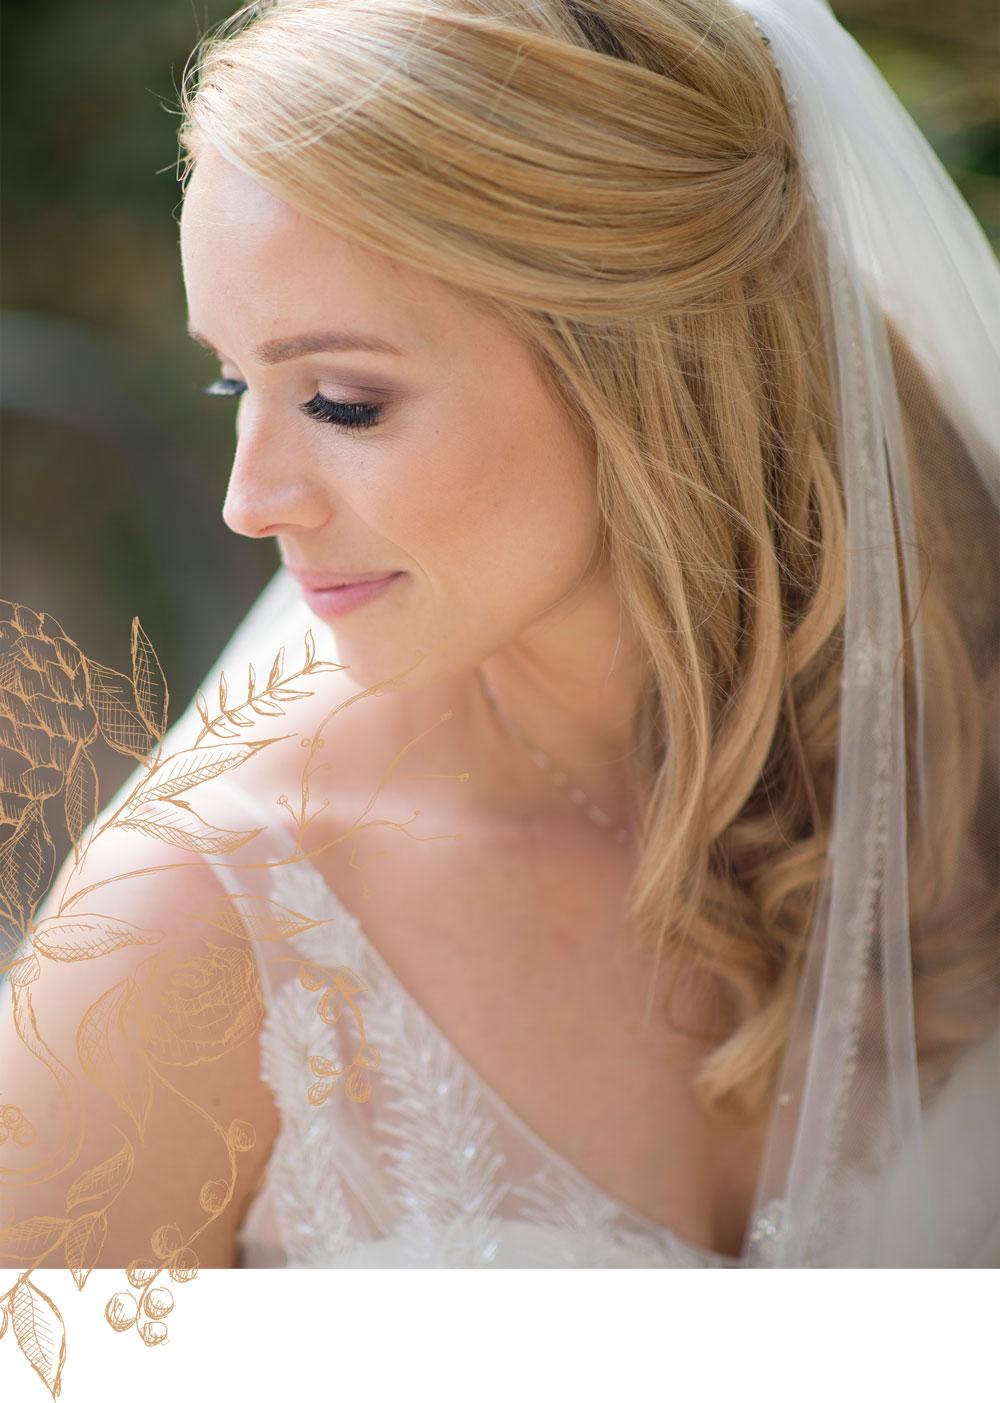 Botanical-Overlay-4-international-wedding-planners.jpg